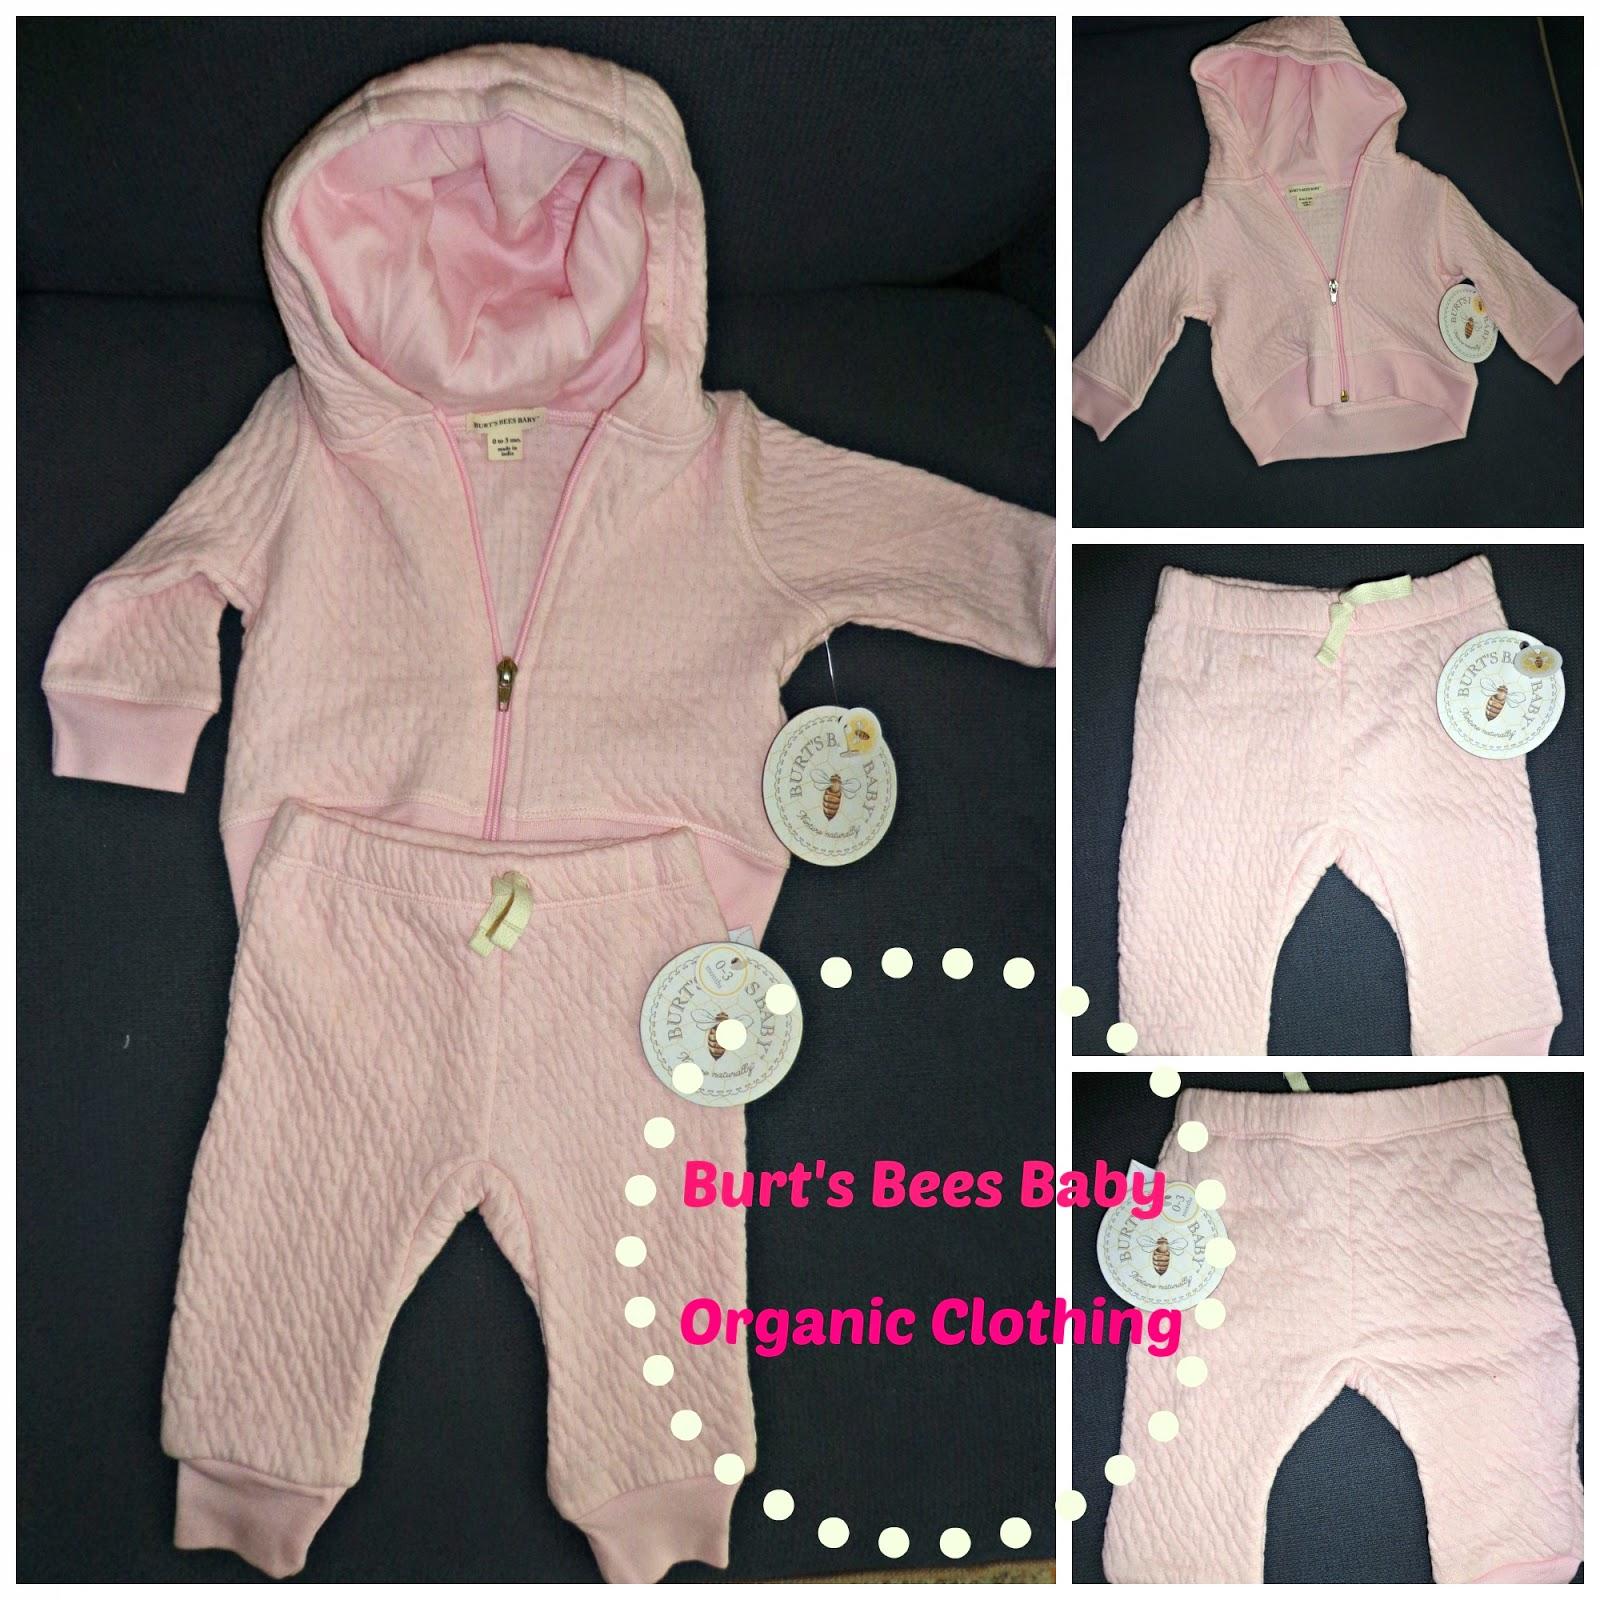 Burt Bees Baby Organic Clothing Sponsored Attic Girl